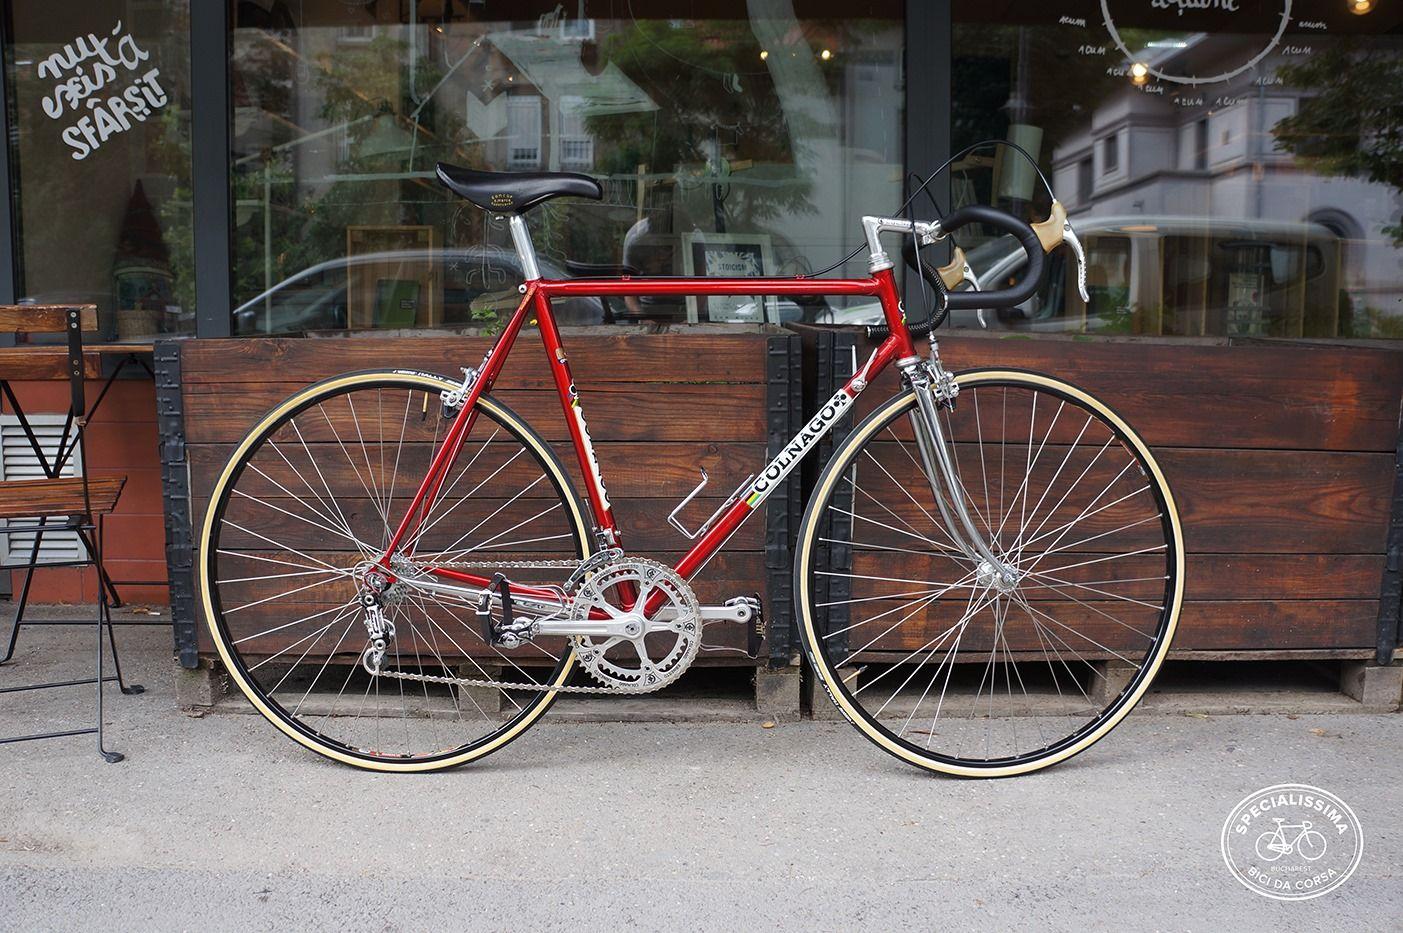 Colnago Super Profil Saronni Red Campagnolo Super Record Titanium Classic Road Bike Road Bike Vintage Beautiful Bike